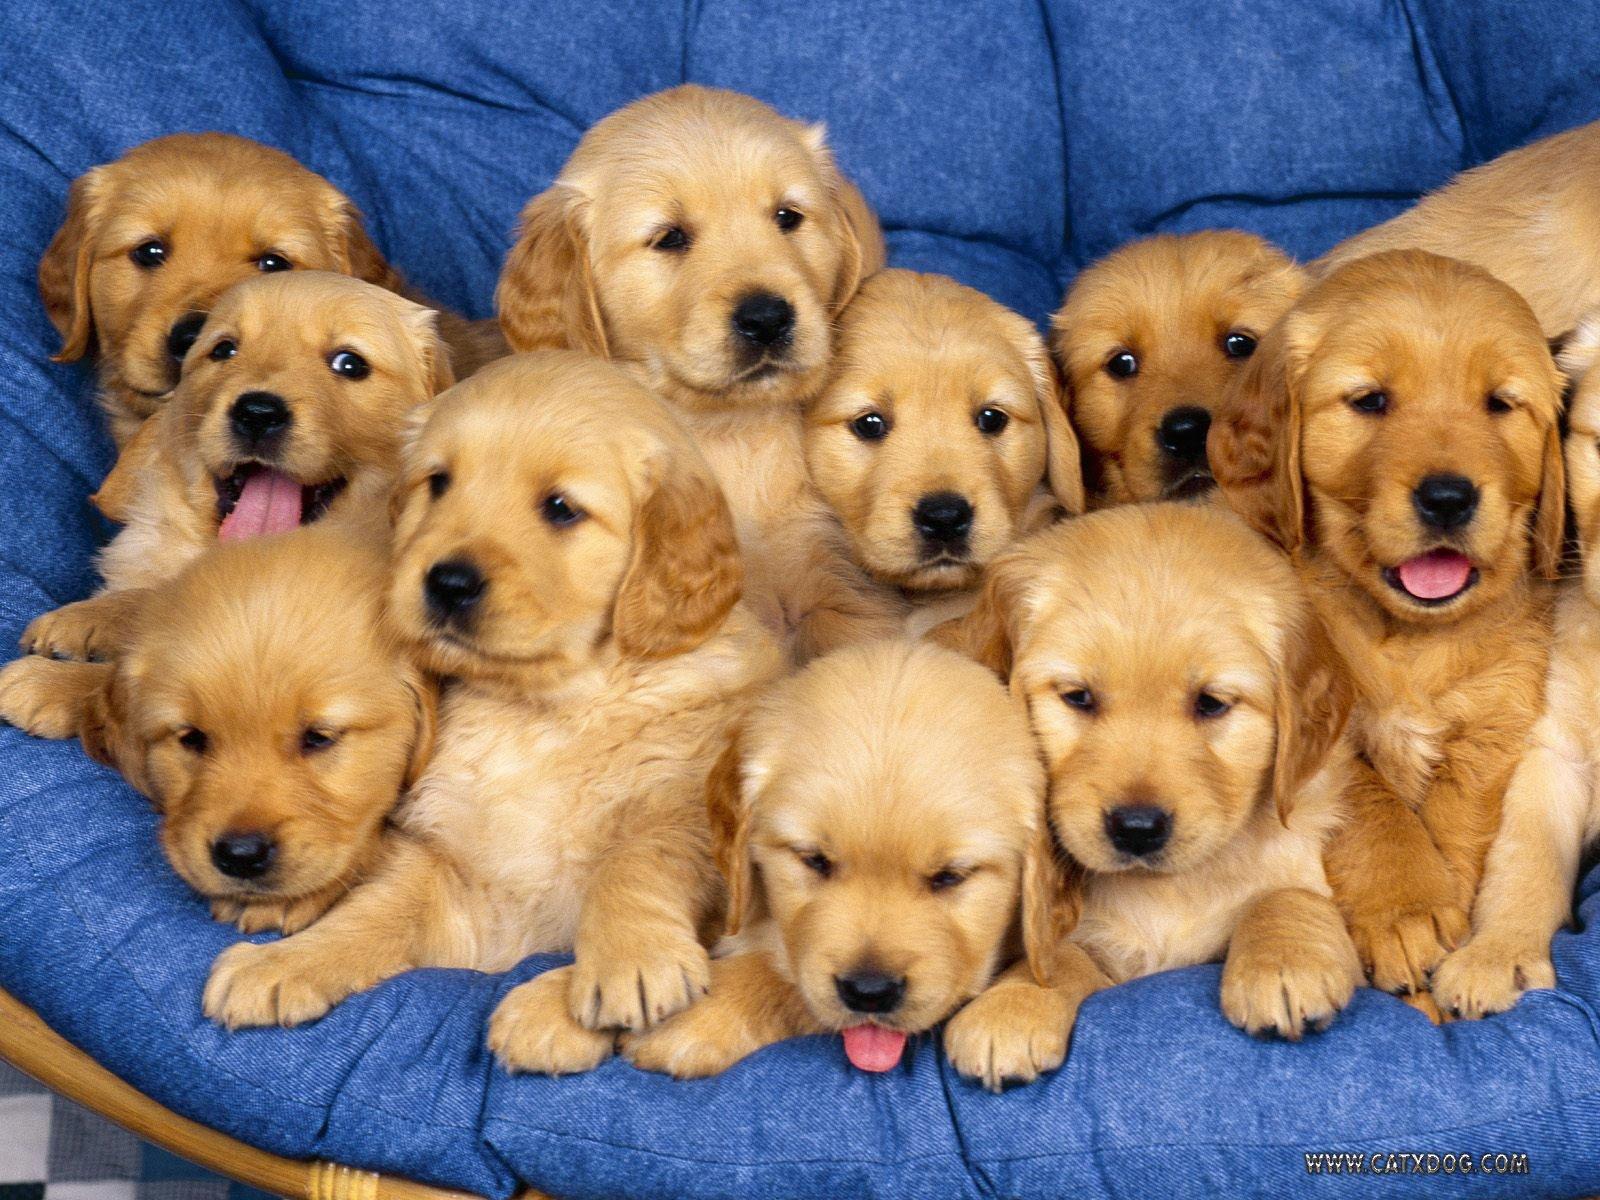 Description Sweet Puppy Dog Wallpaper is a hi res Wallpaper for pc 1600x1200